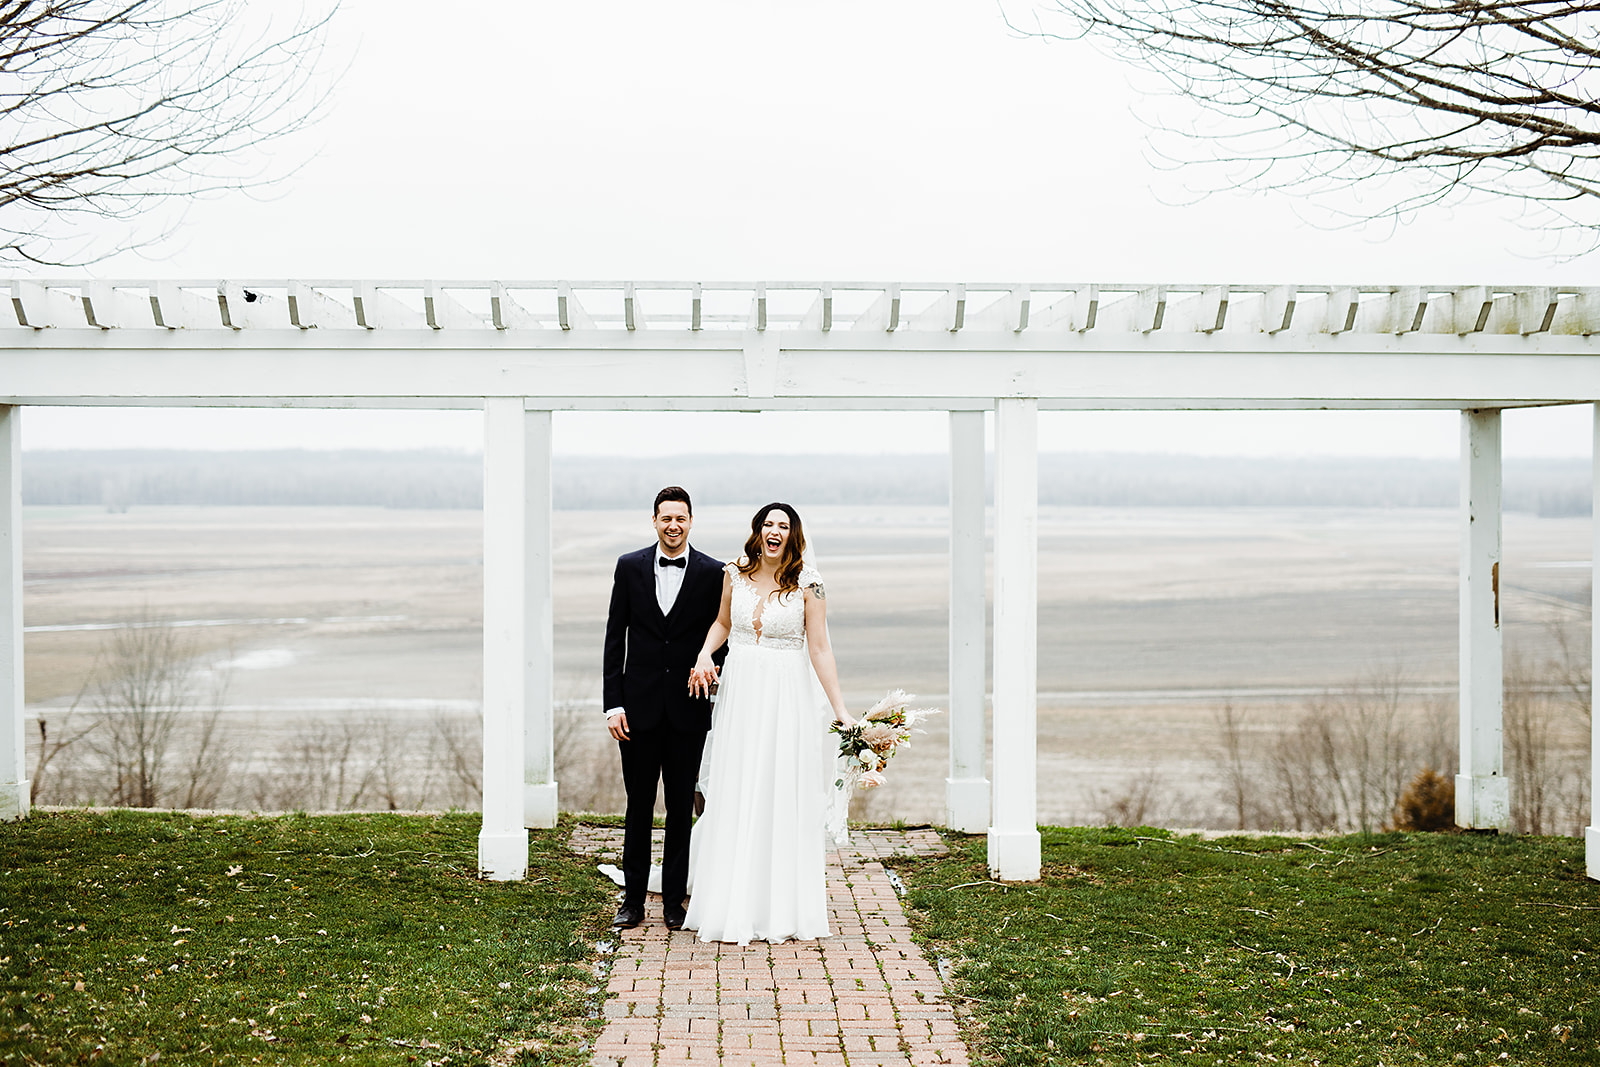 minimony or microwedding - bride and groom under a trellis